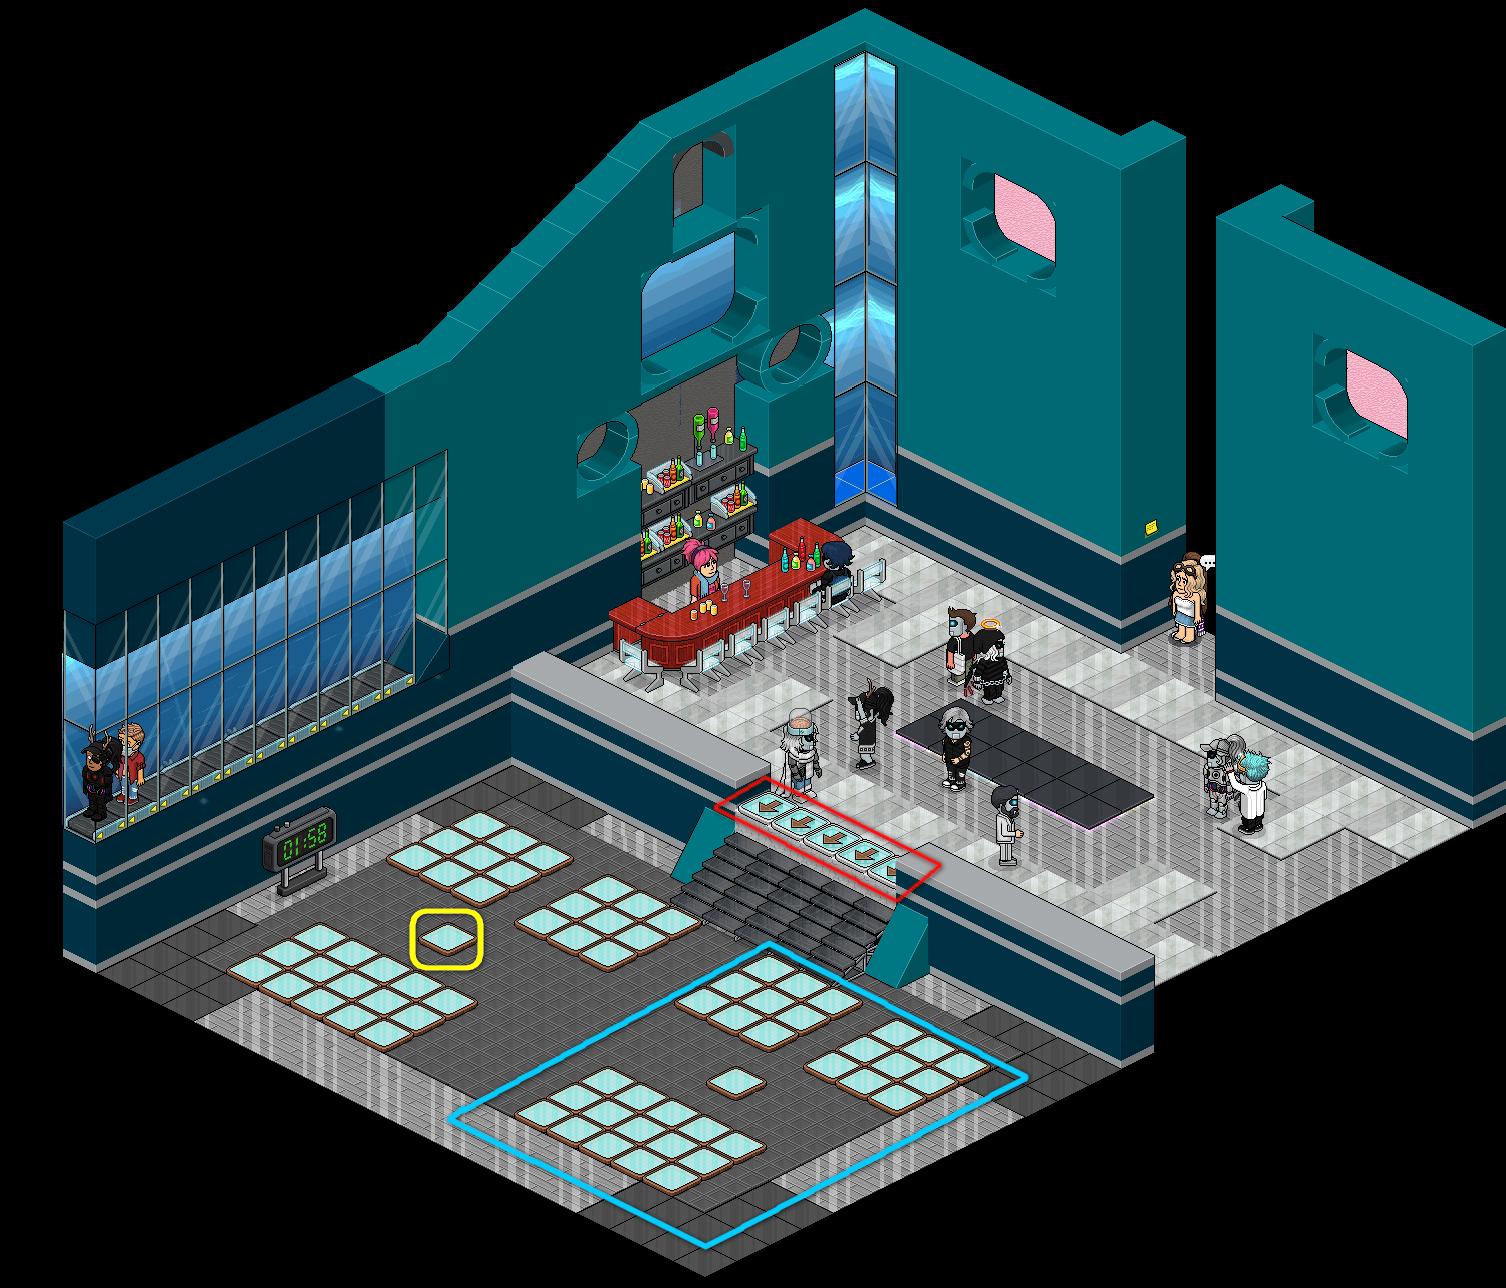 [JEU] CLUB ROBOTISÉ